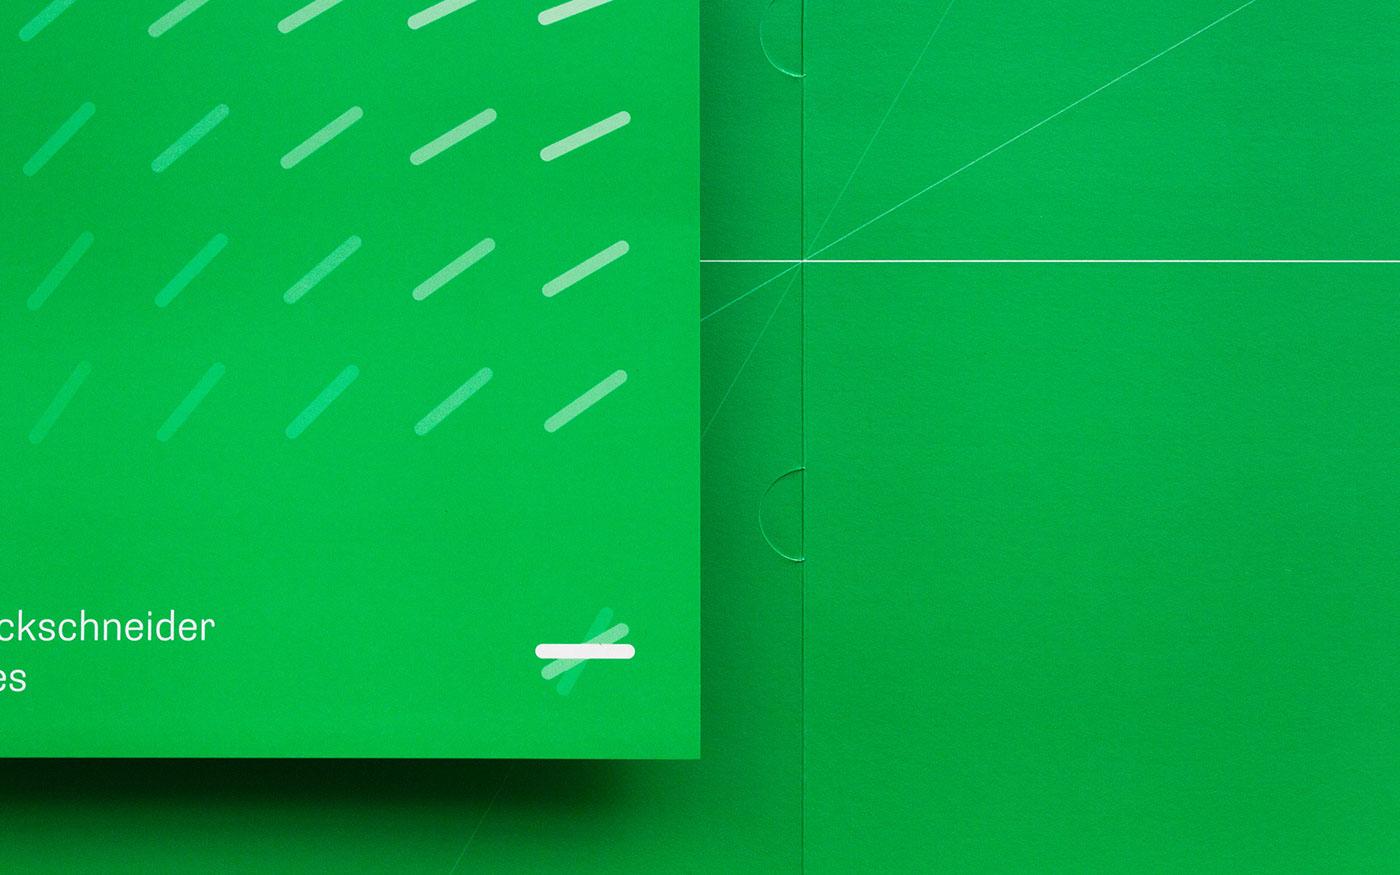 law green bold movement straightforward symbol abstract Justice Transparency minimalist